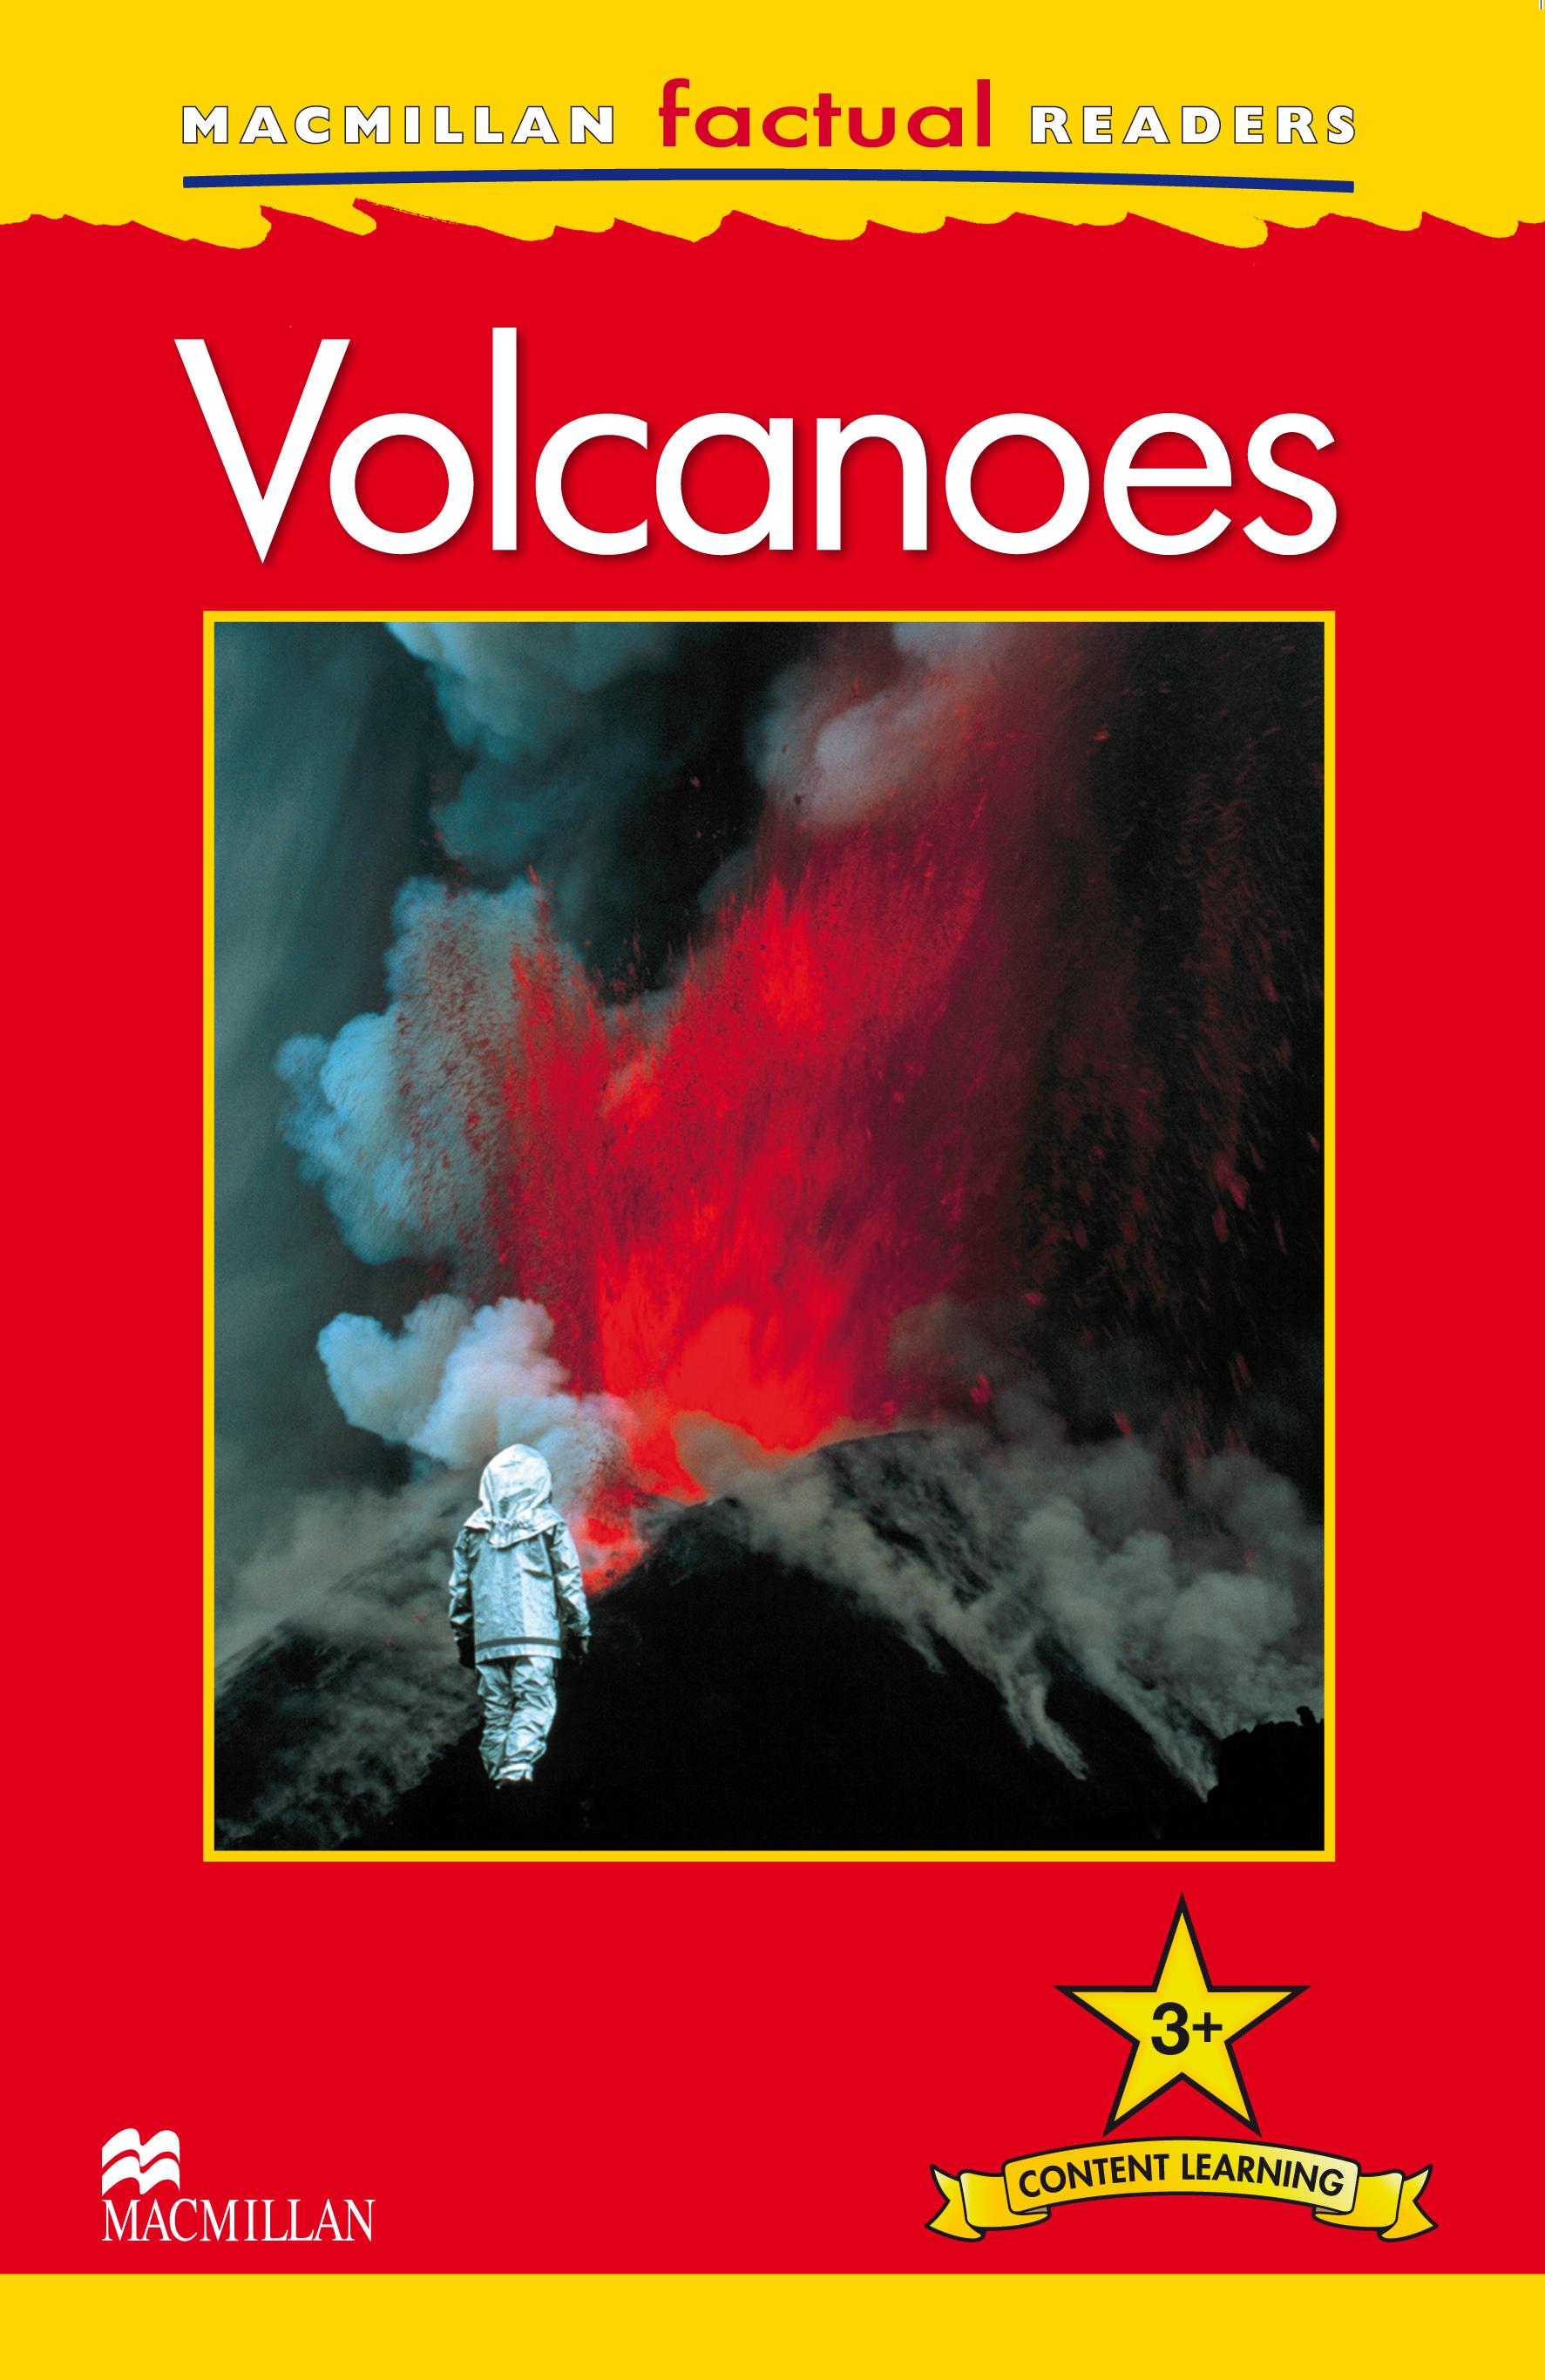 Macmillan Factual Readers: Volcanoes